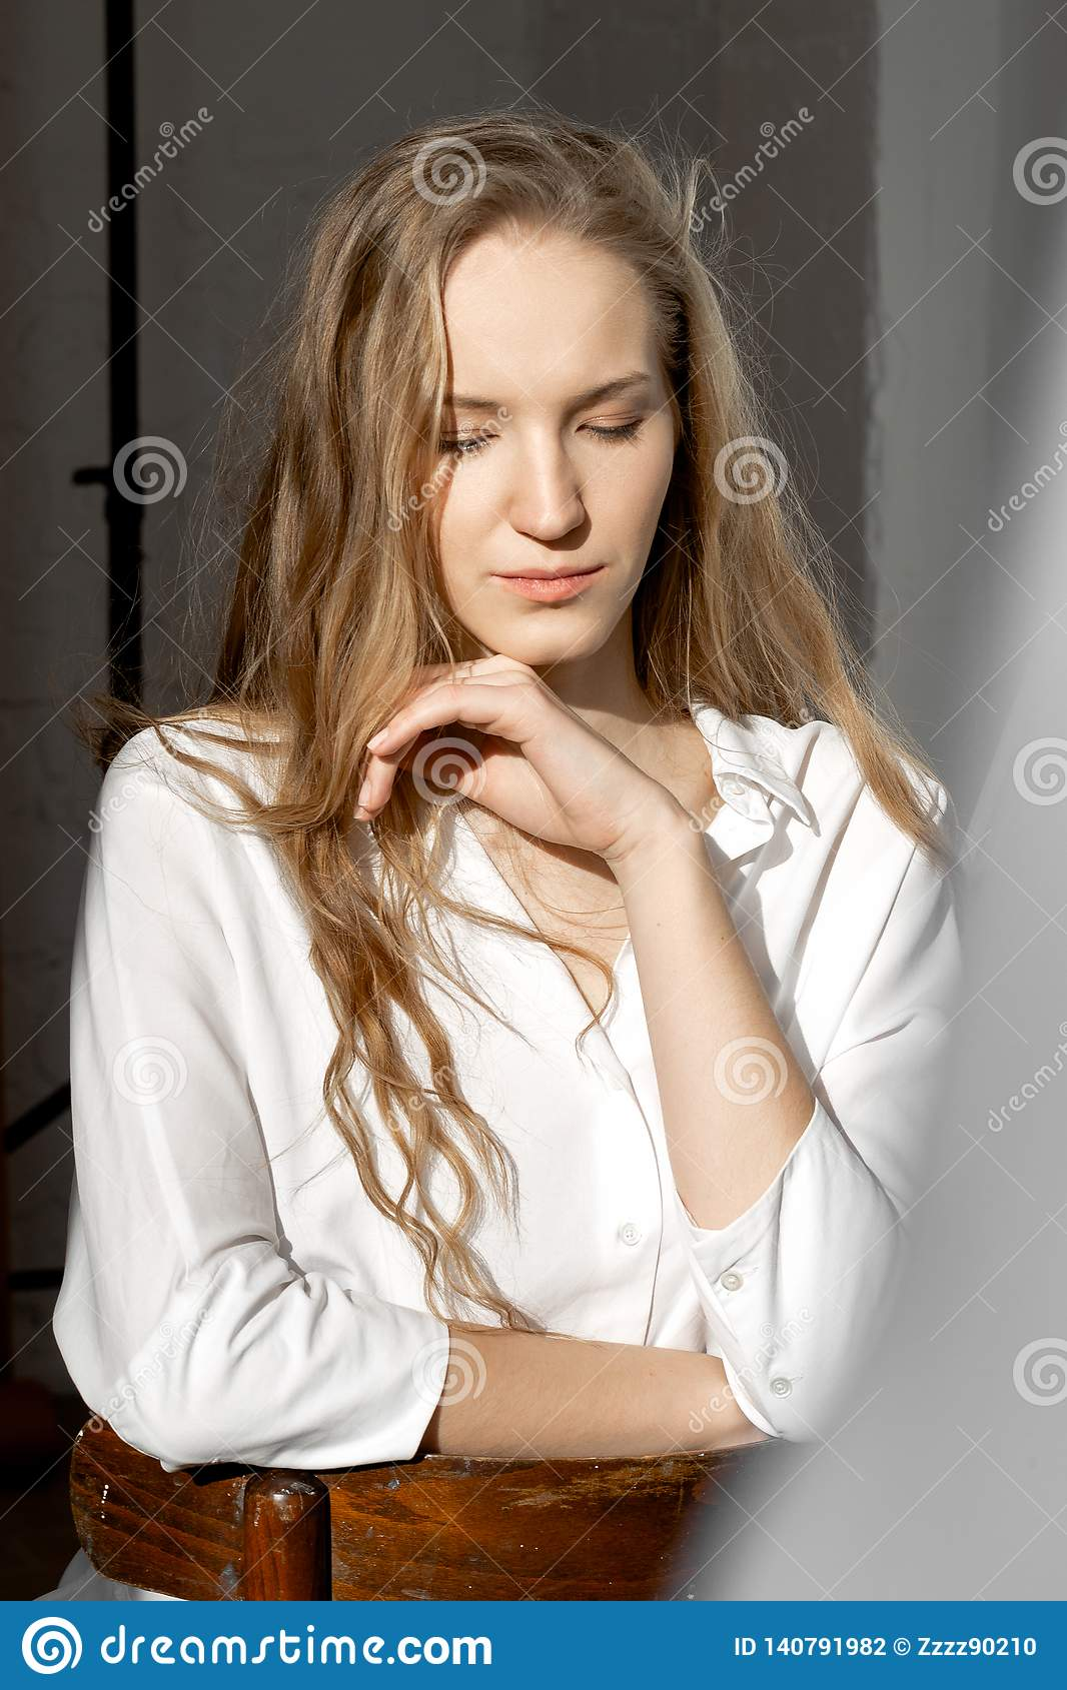 Modelo pensativo triste que olha para baixo na camisa branca